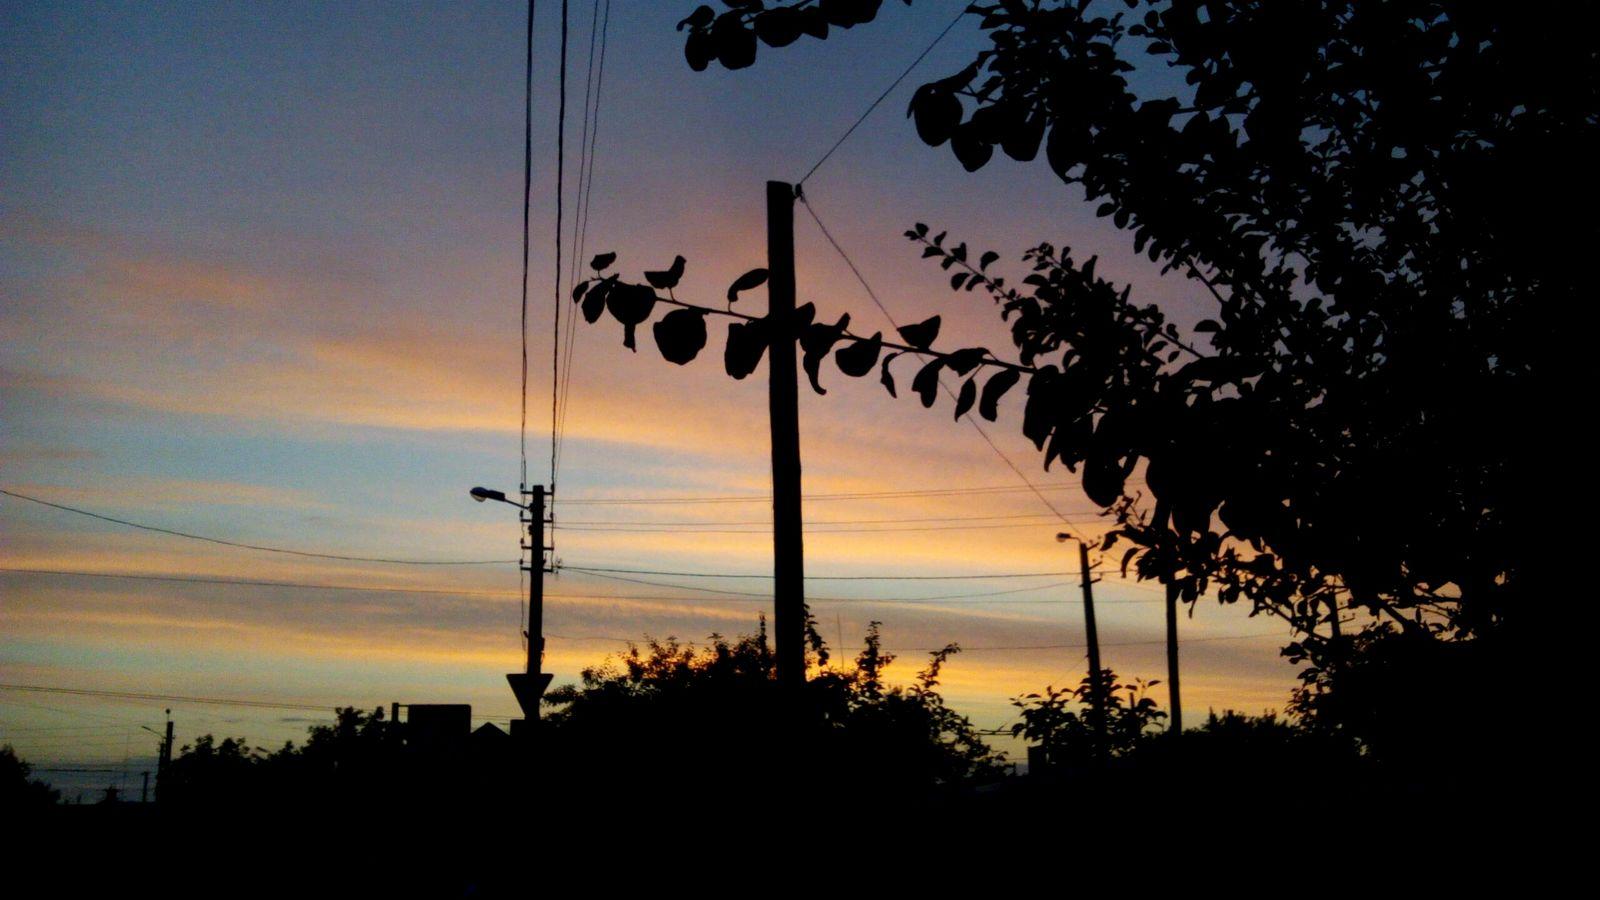 Ukraine Beautiful Sky Sunset Evening Sky Summer2015 Bila Tserkva